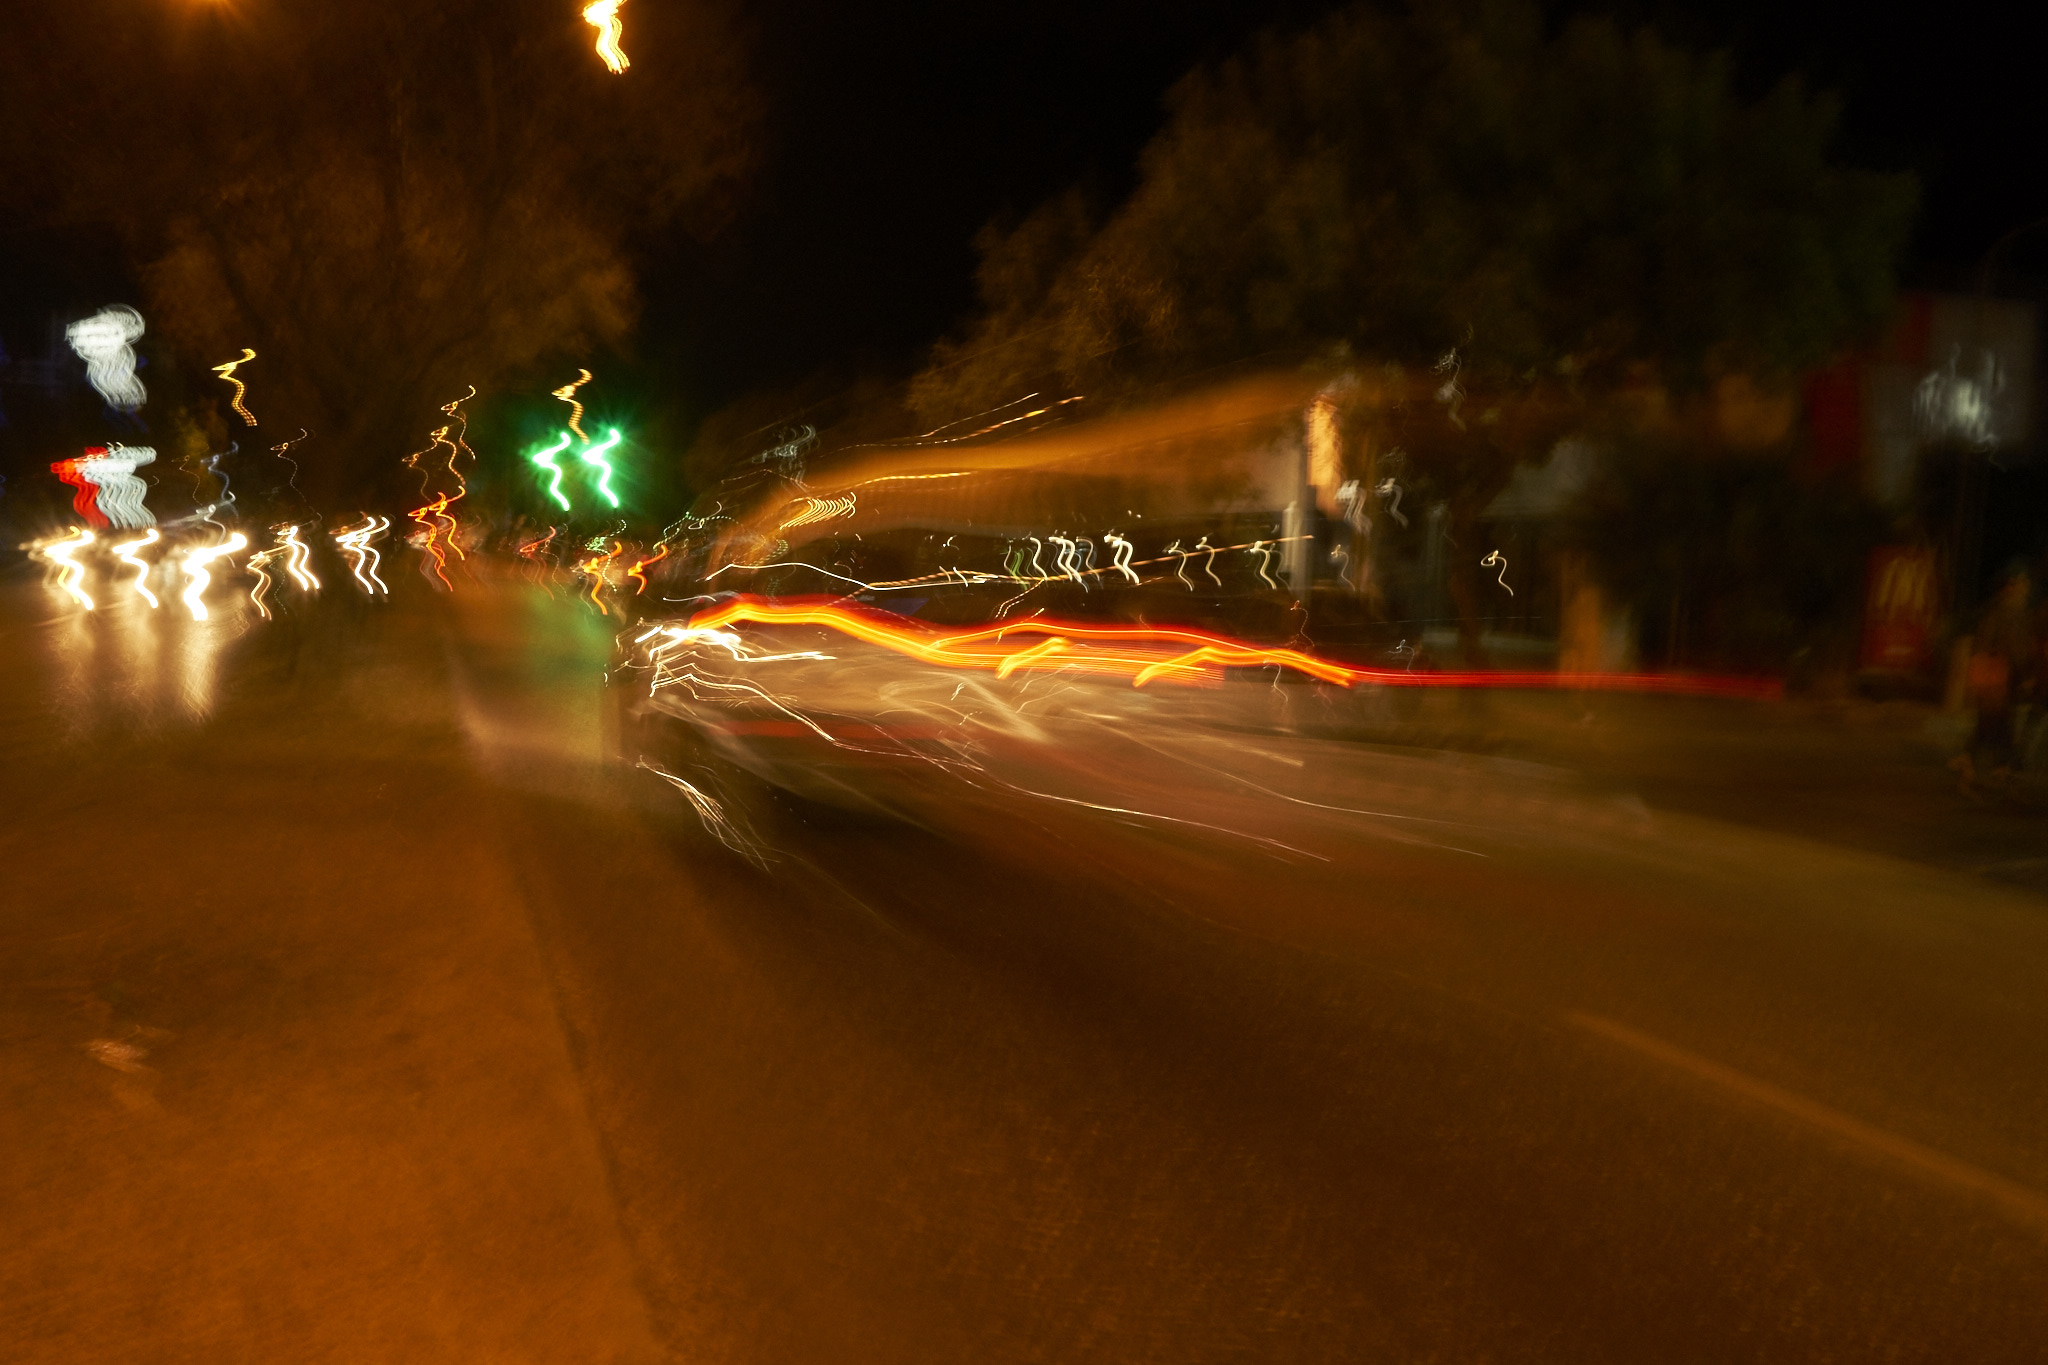 70 Fotografo de Casamientos - Bodas en Tucson - Cordoba DSC06750.jpg